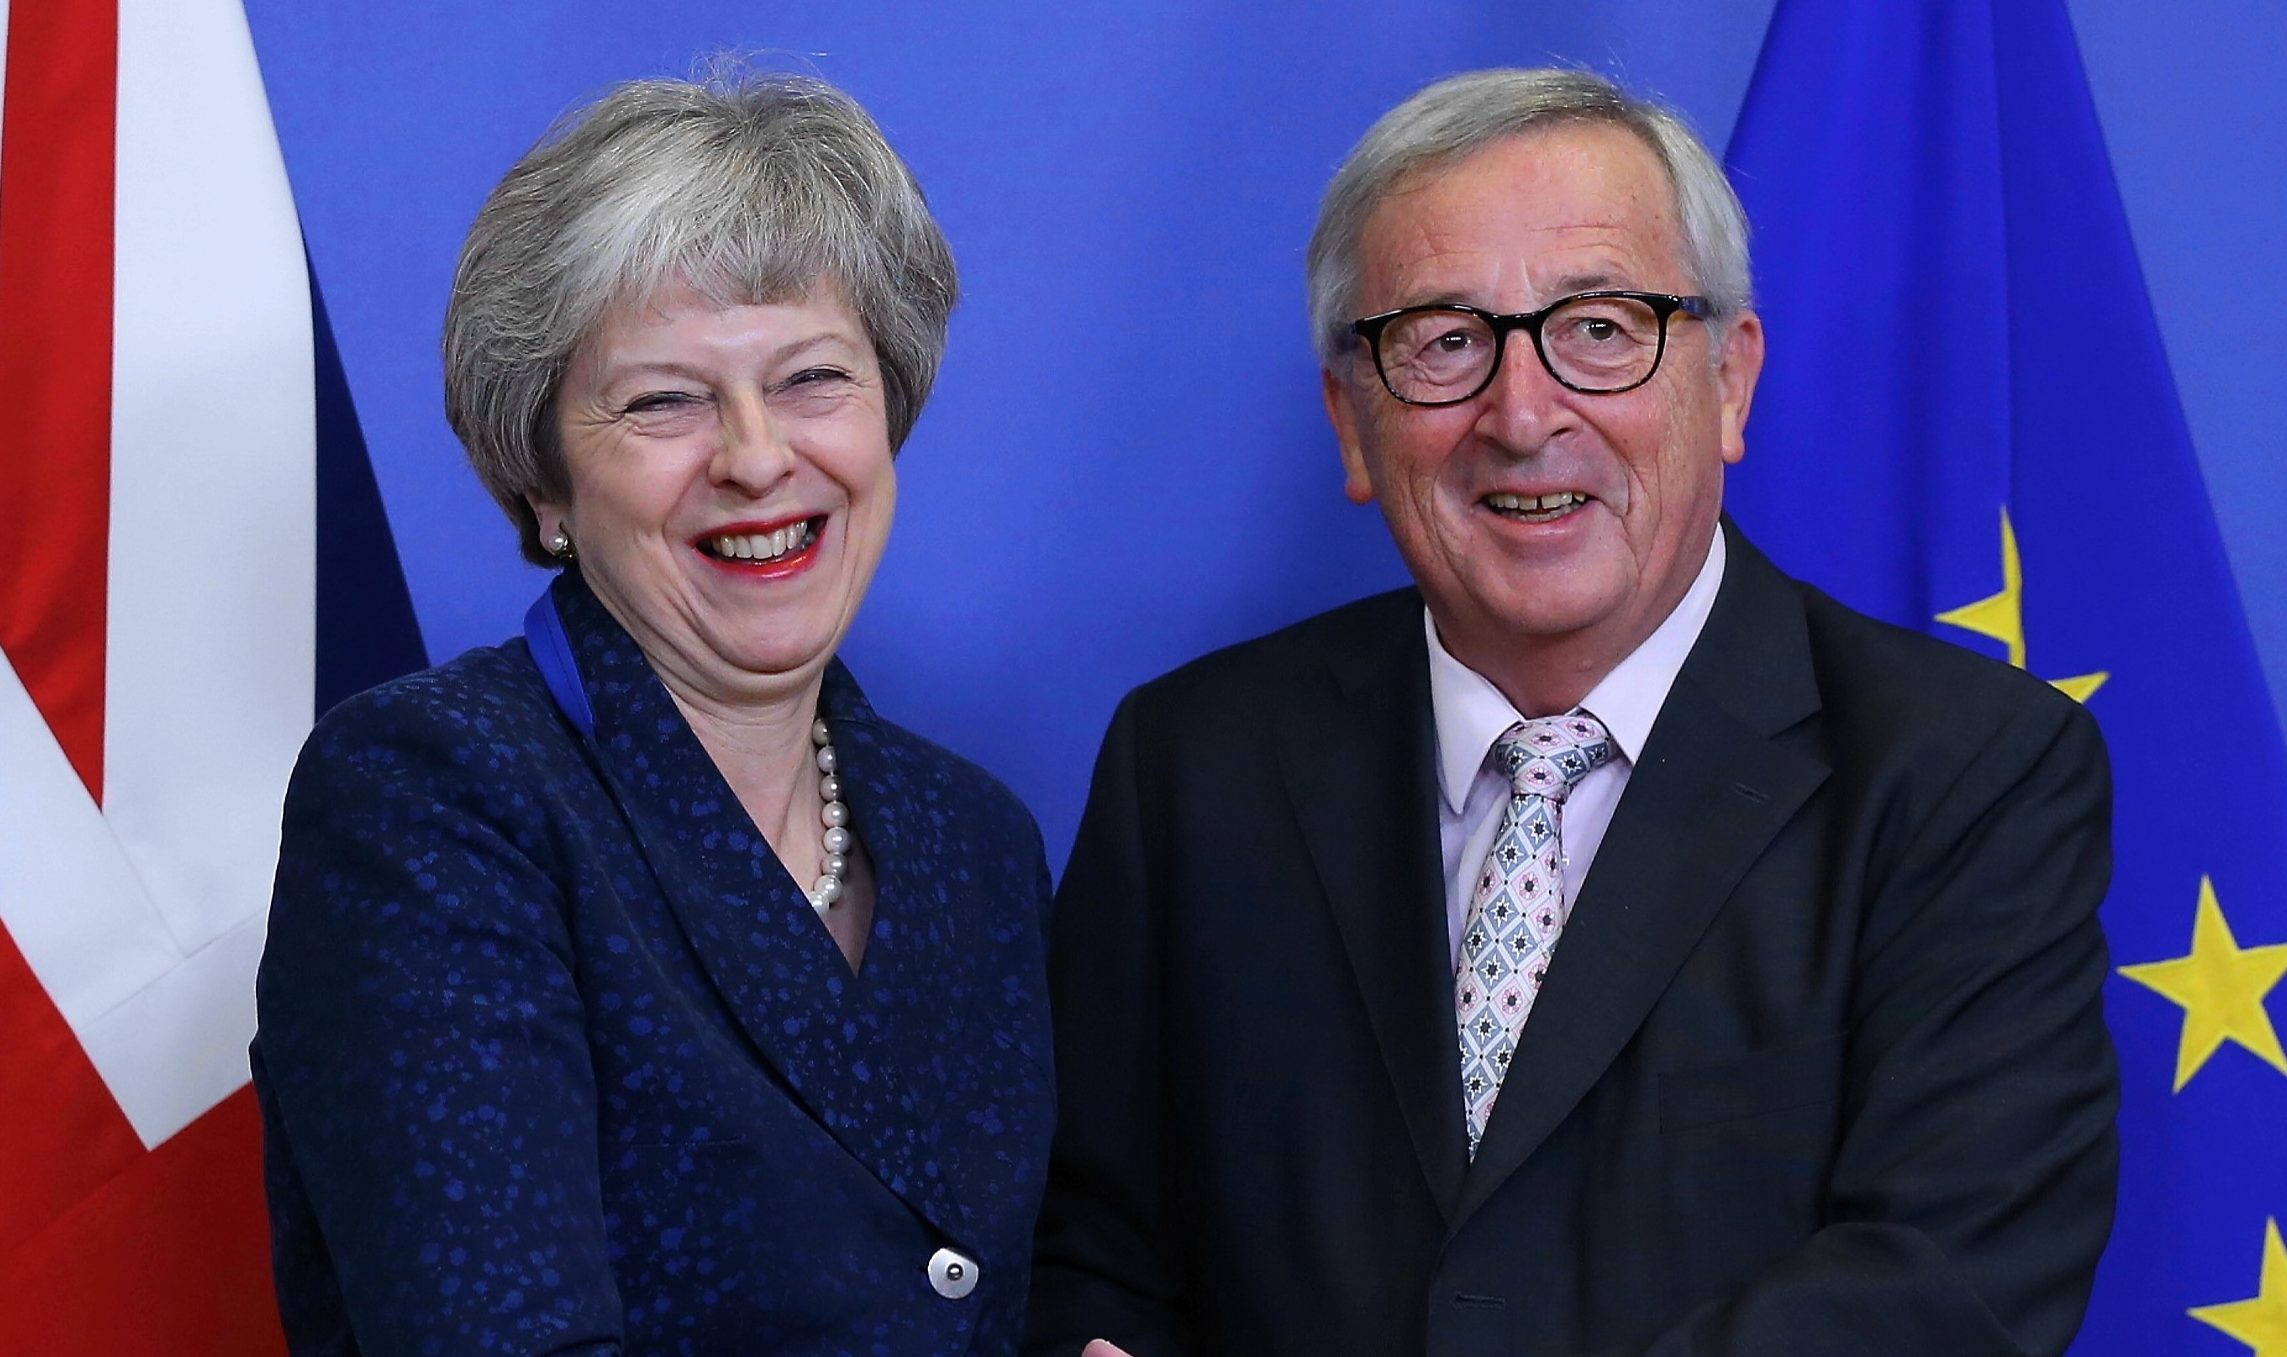 European Commission President Jean-Claude Juncker, welcomes  Theresa May in Brussels yesterday (Dursun Aydemir/Anadolu Agency/Getty Images)